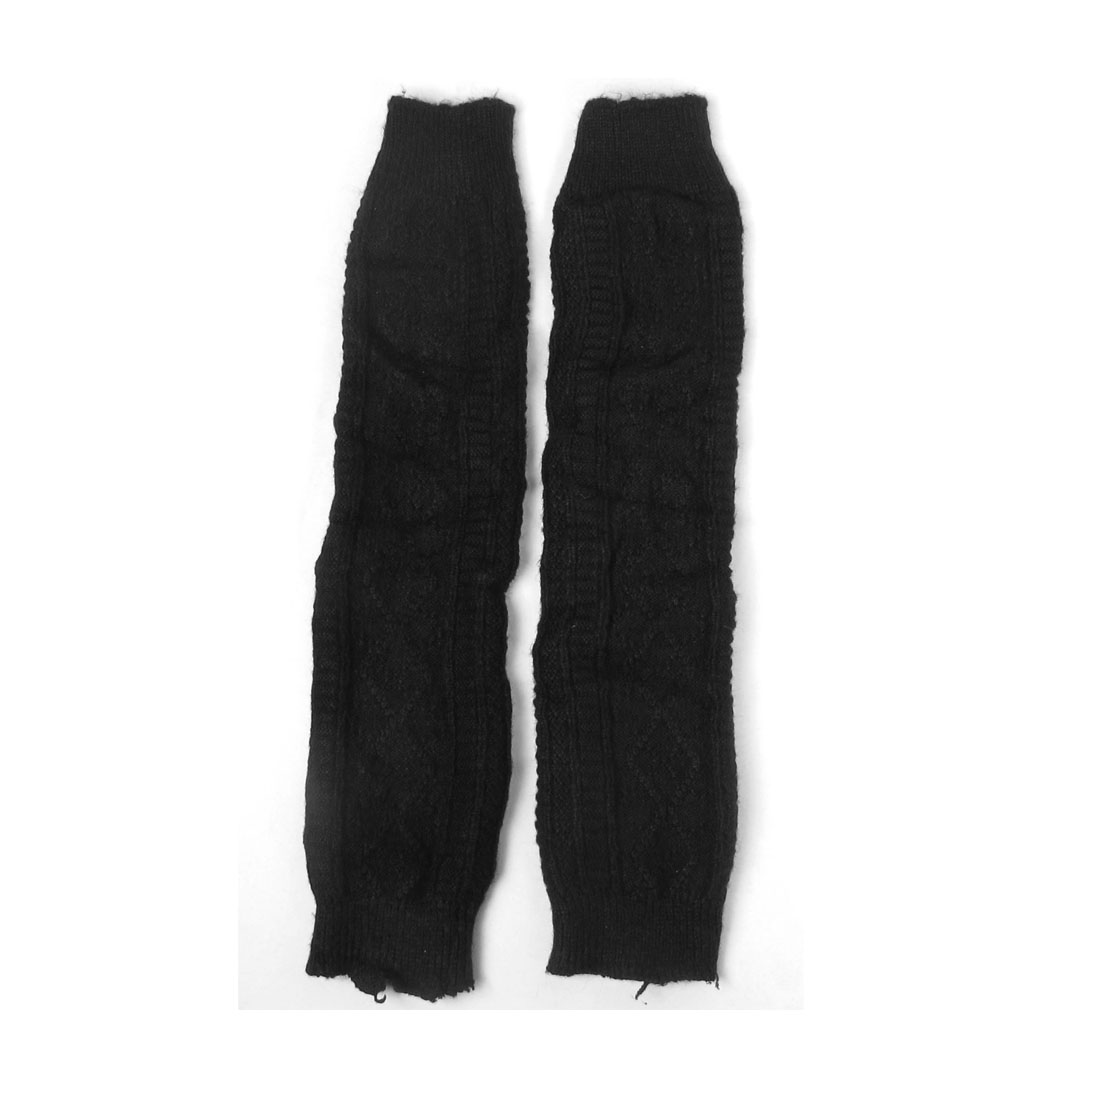 Pair Rhombus Pattern Knitted Knee High Leg Warmers Black for Women